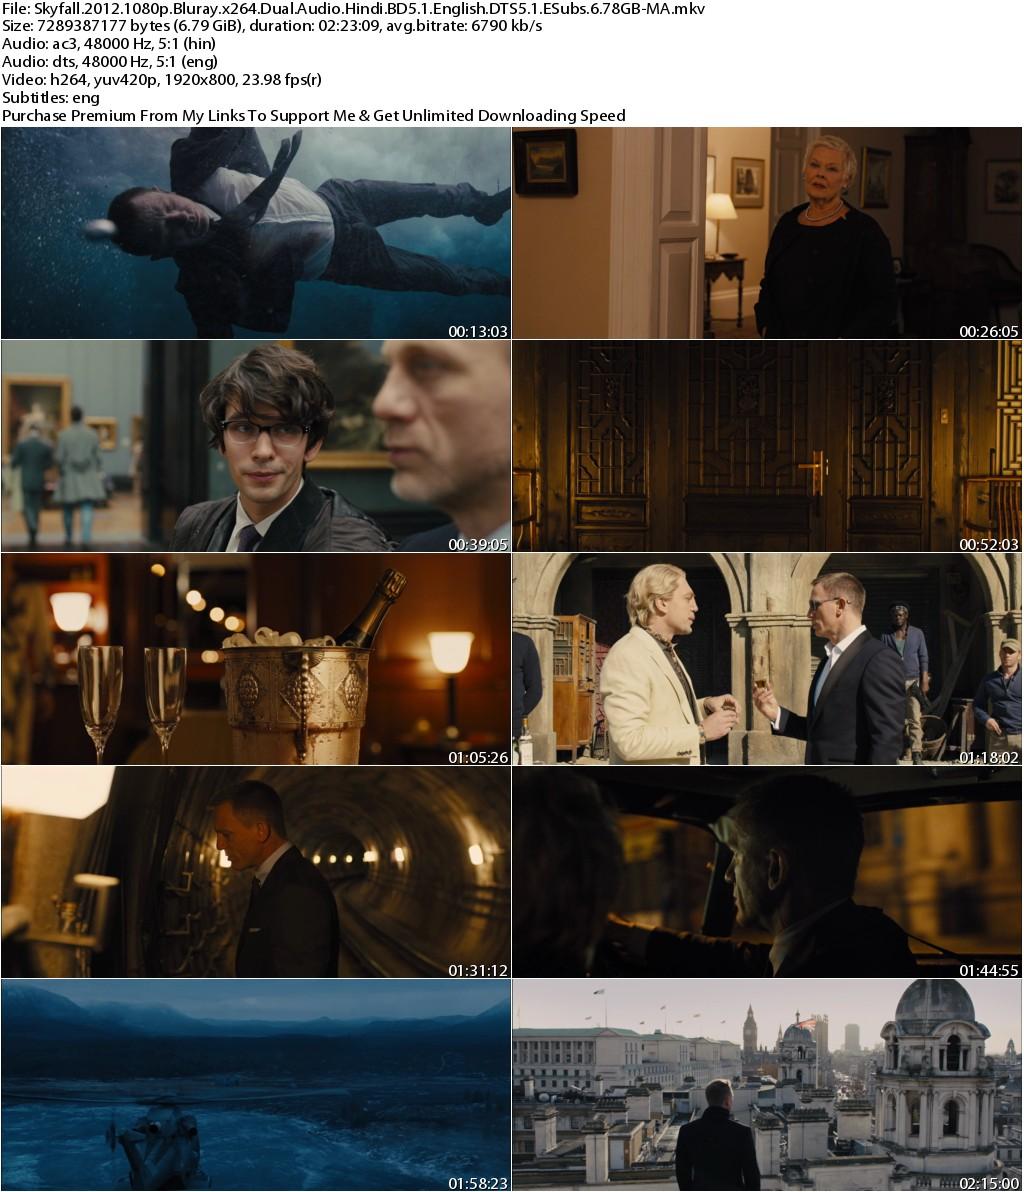 Skyfall (2012) 1080p Bluray x264 Dual Audio Hindi BD5.1 English DTS5.1 ESubs 6.78GB-MA